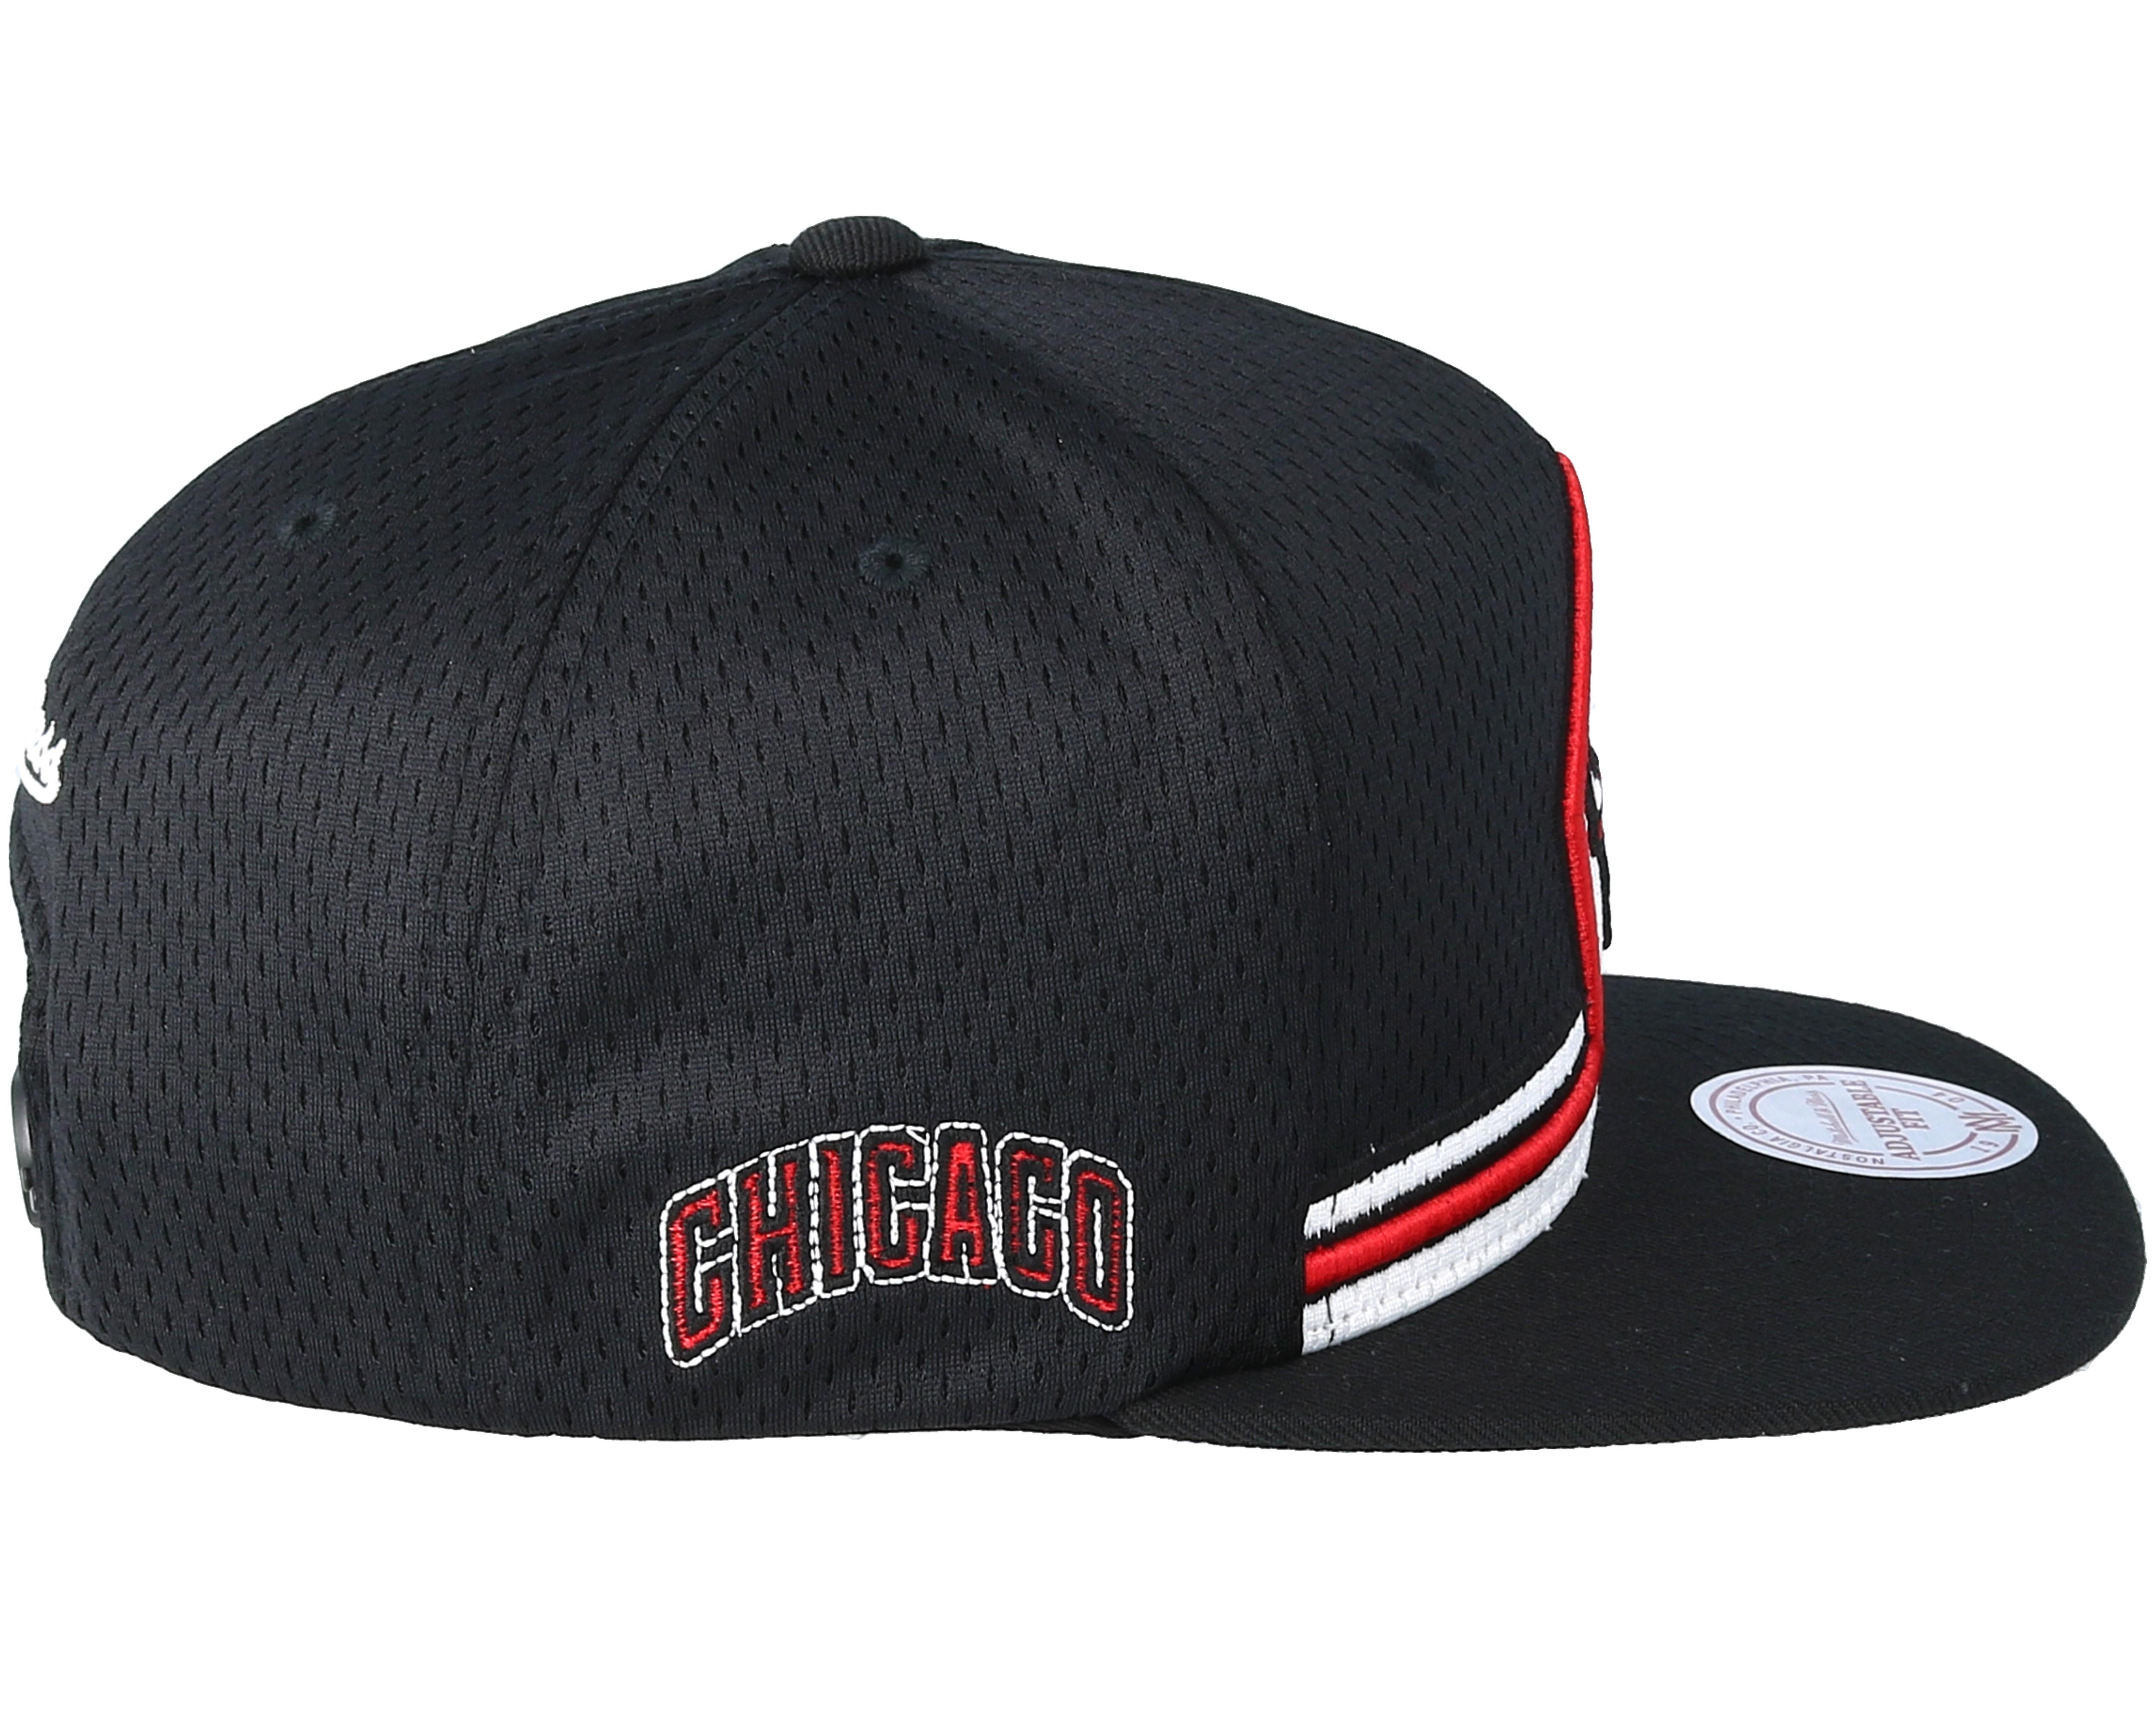 chicago bulls jersey black snapback mitchell ness caps. Black Bedroom Furniture Sets. Home Design Ideas